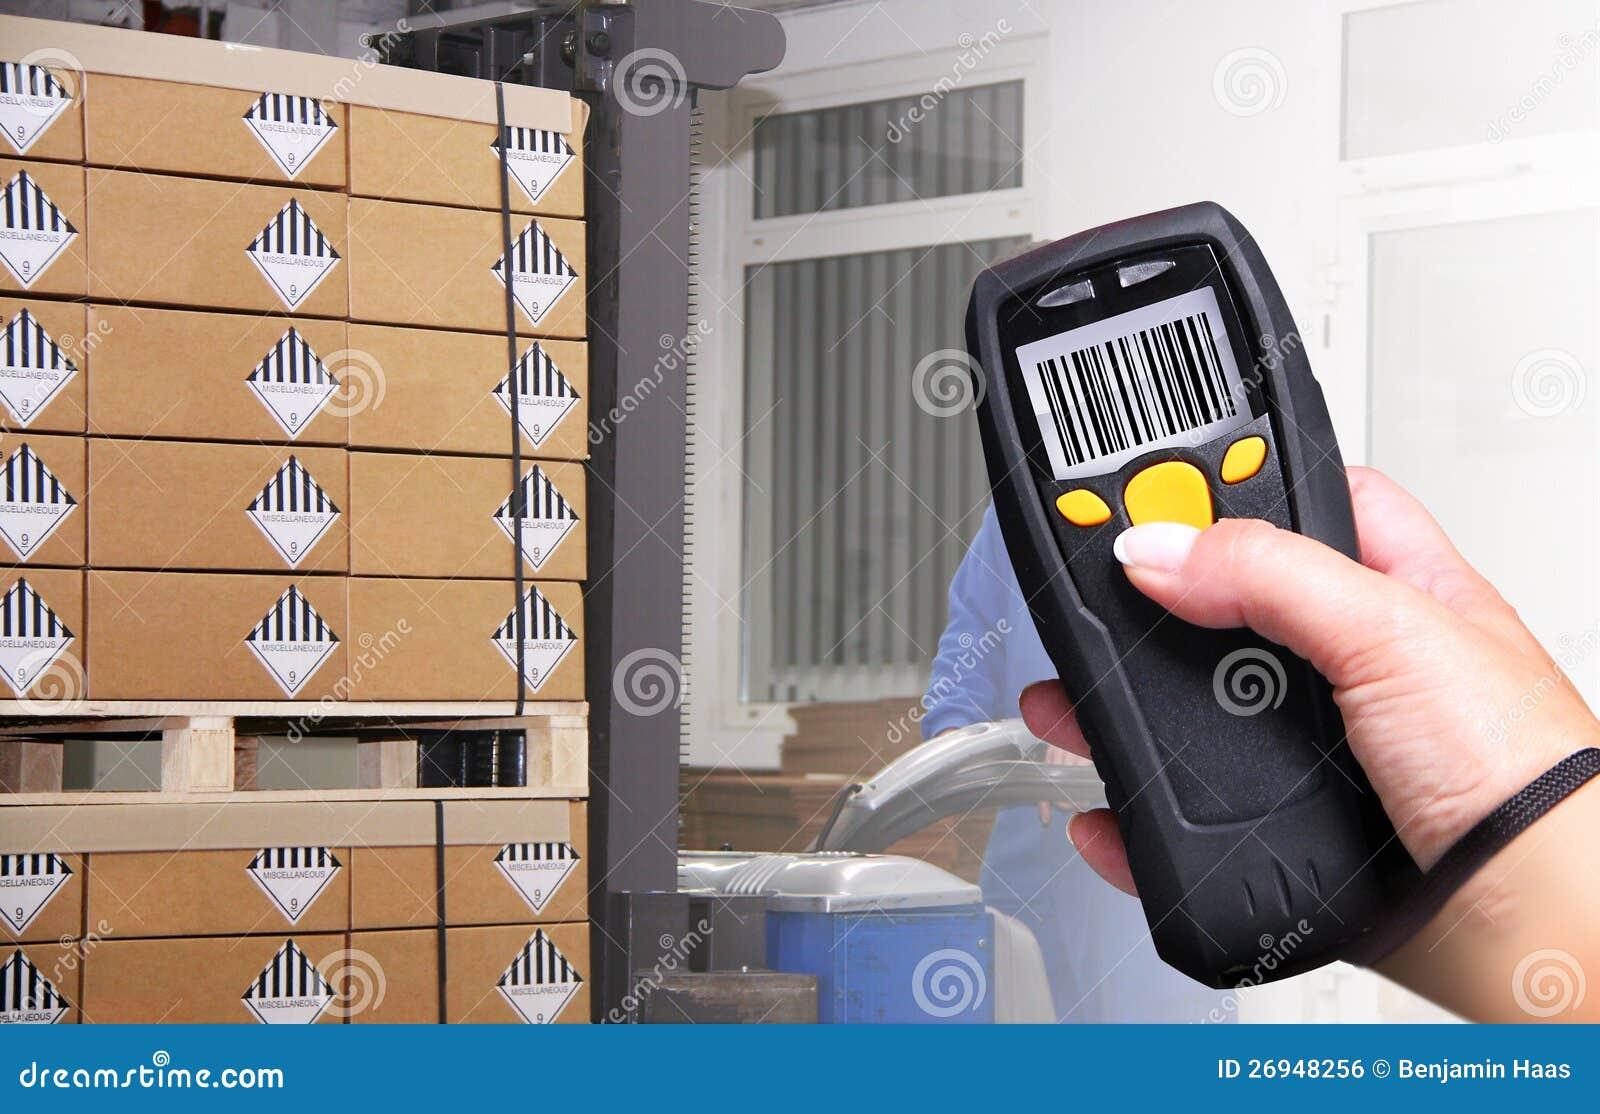 Barcode Scanner Royalty Free Stock Image Image 26948256